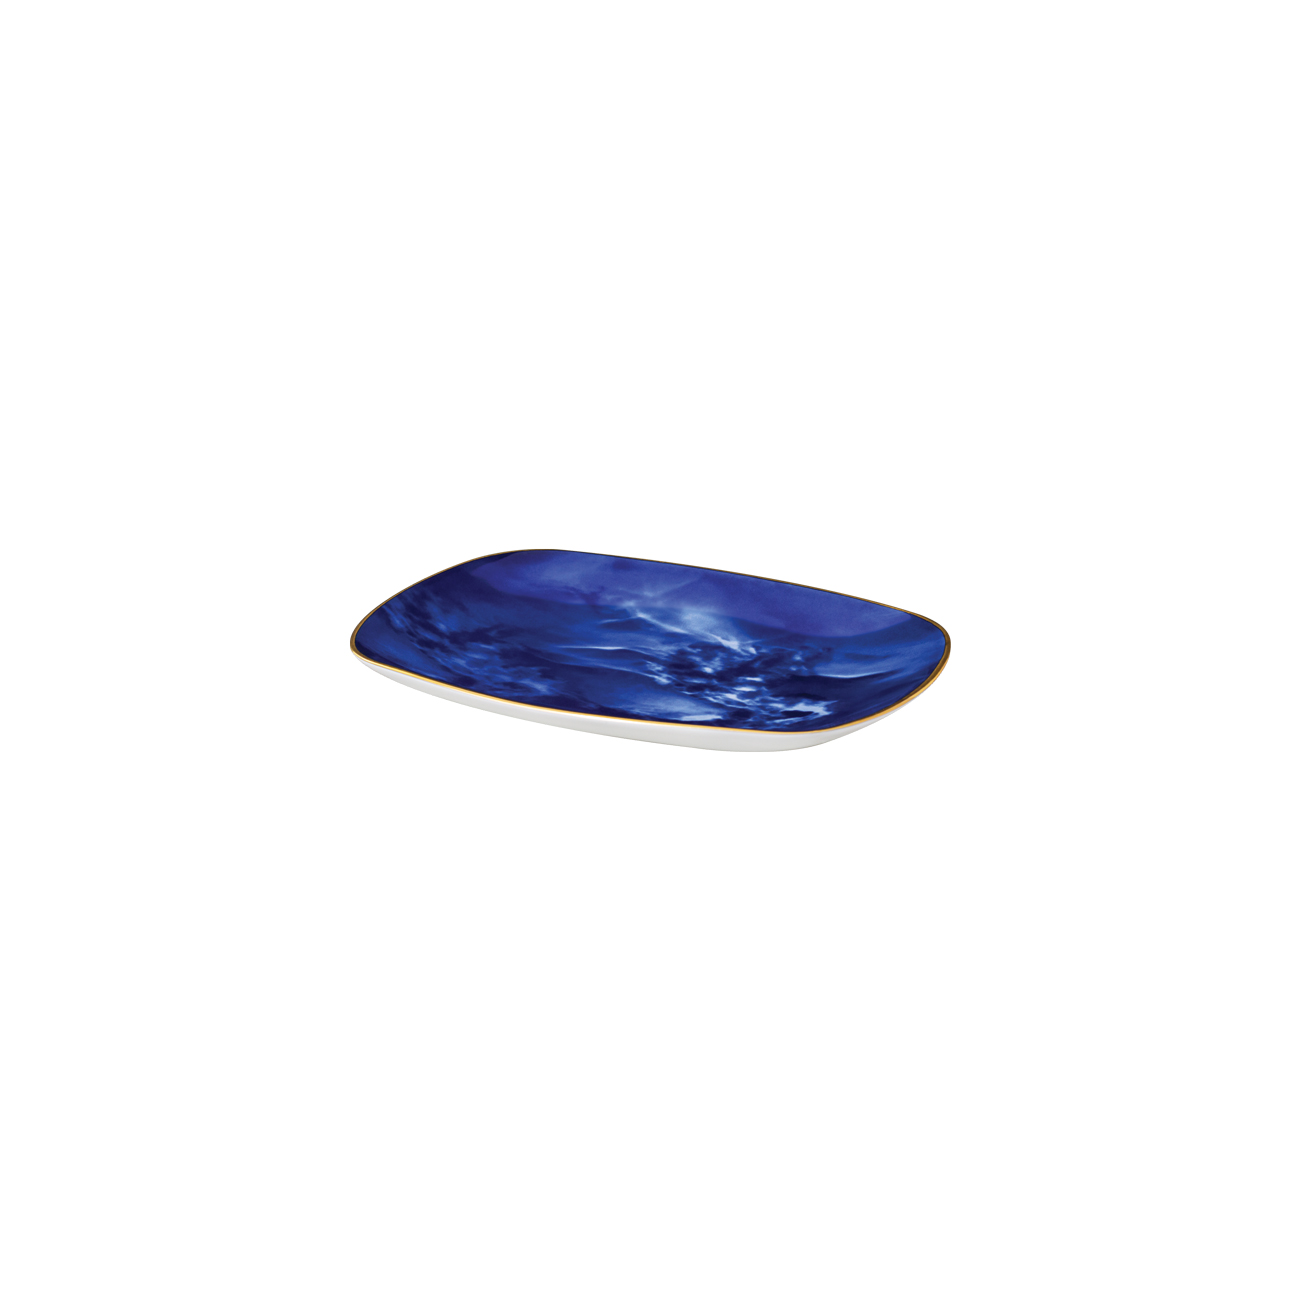 Rectangular Platter 13x18cm 0